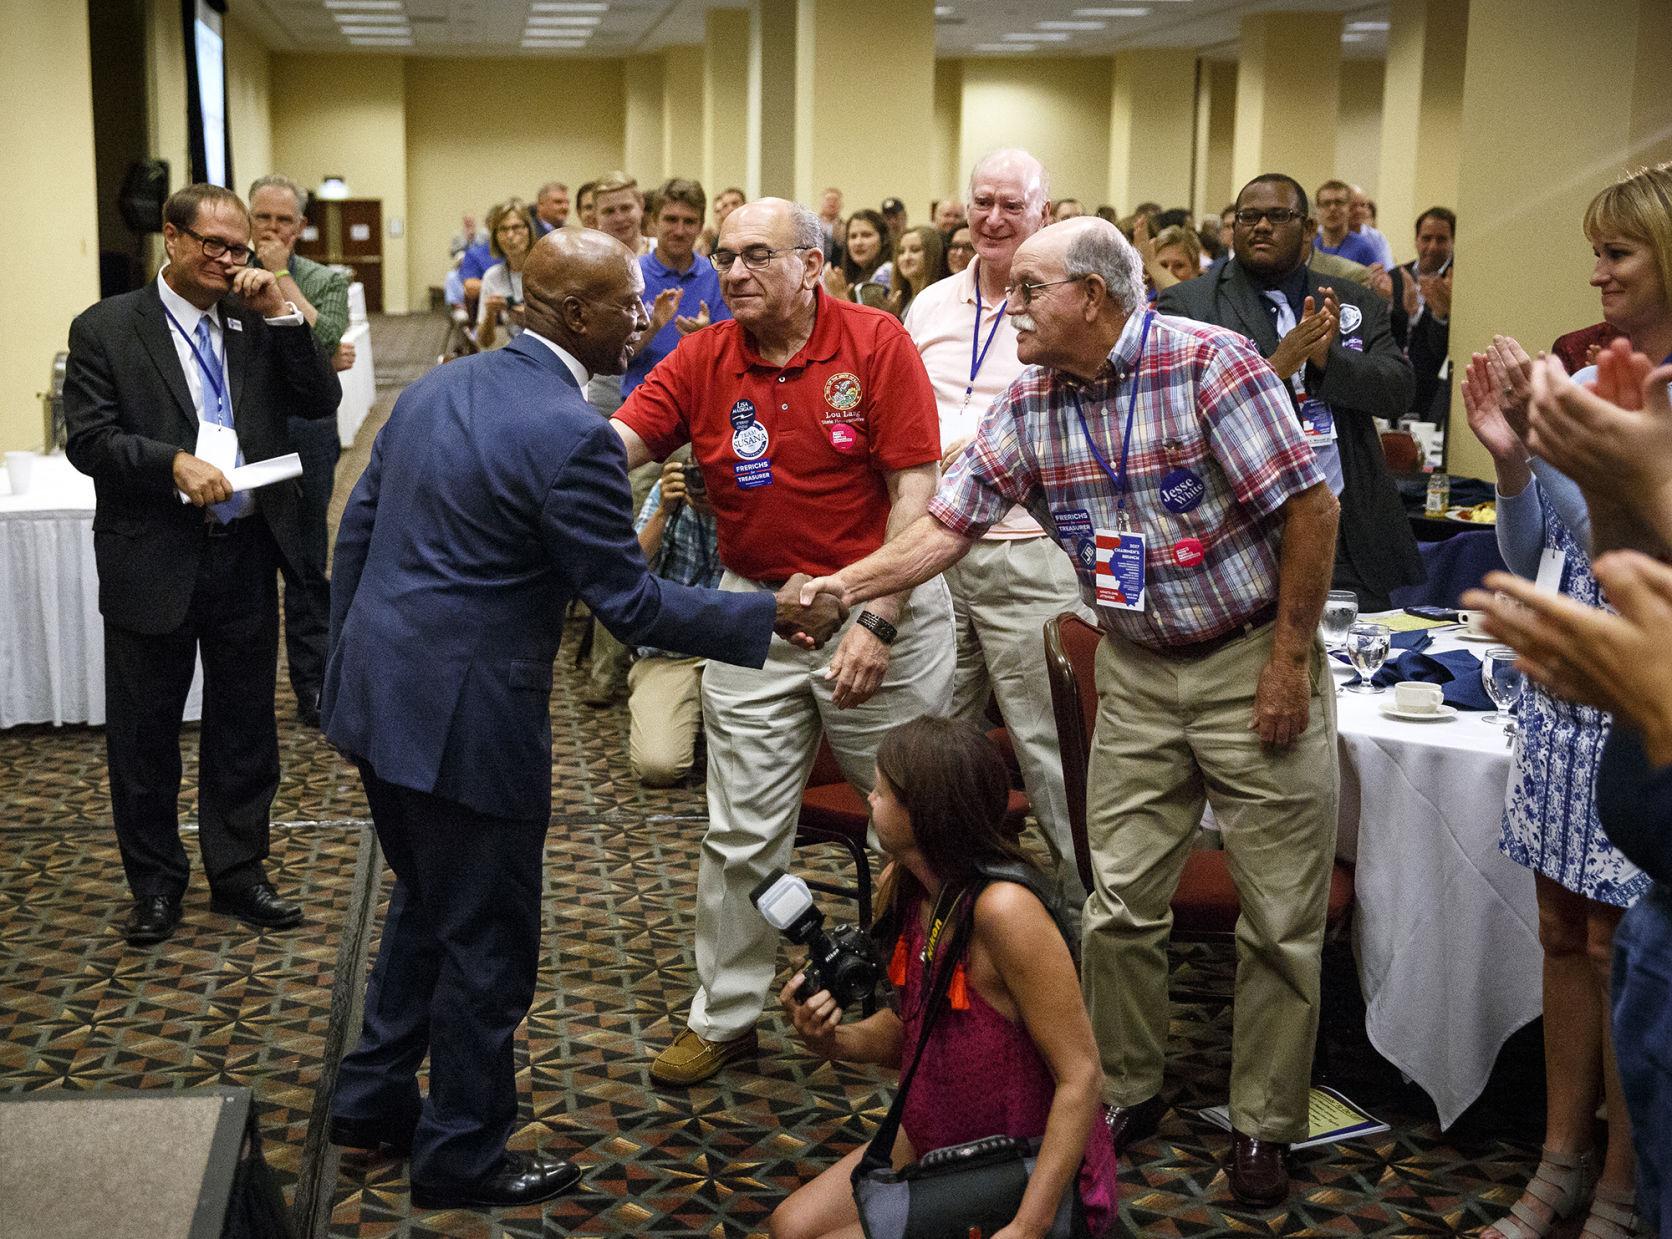 Jesse White, 83, to seek sixth term as secretary of state